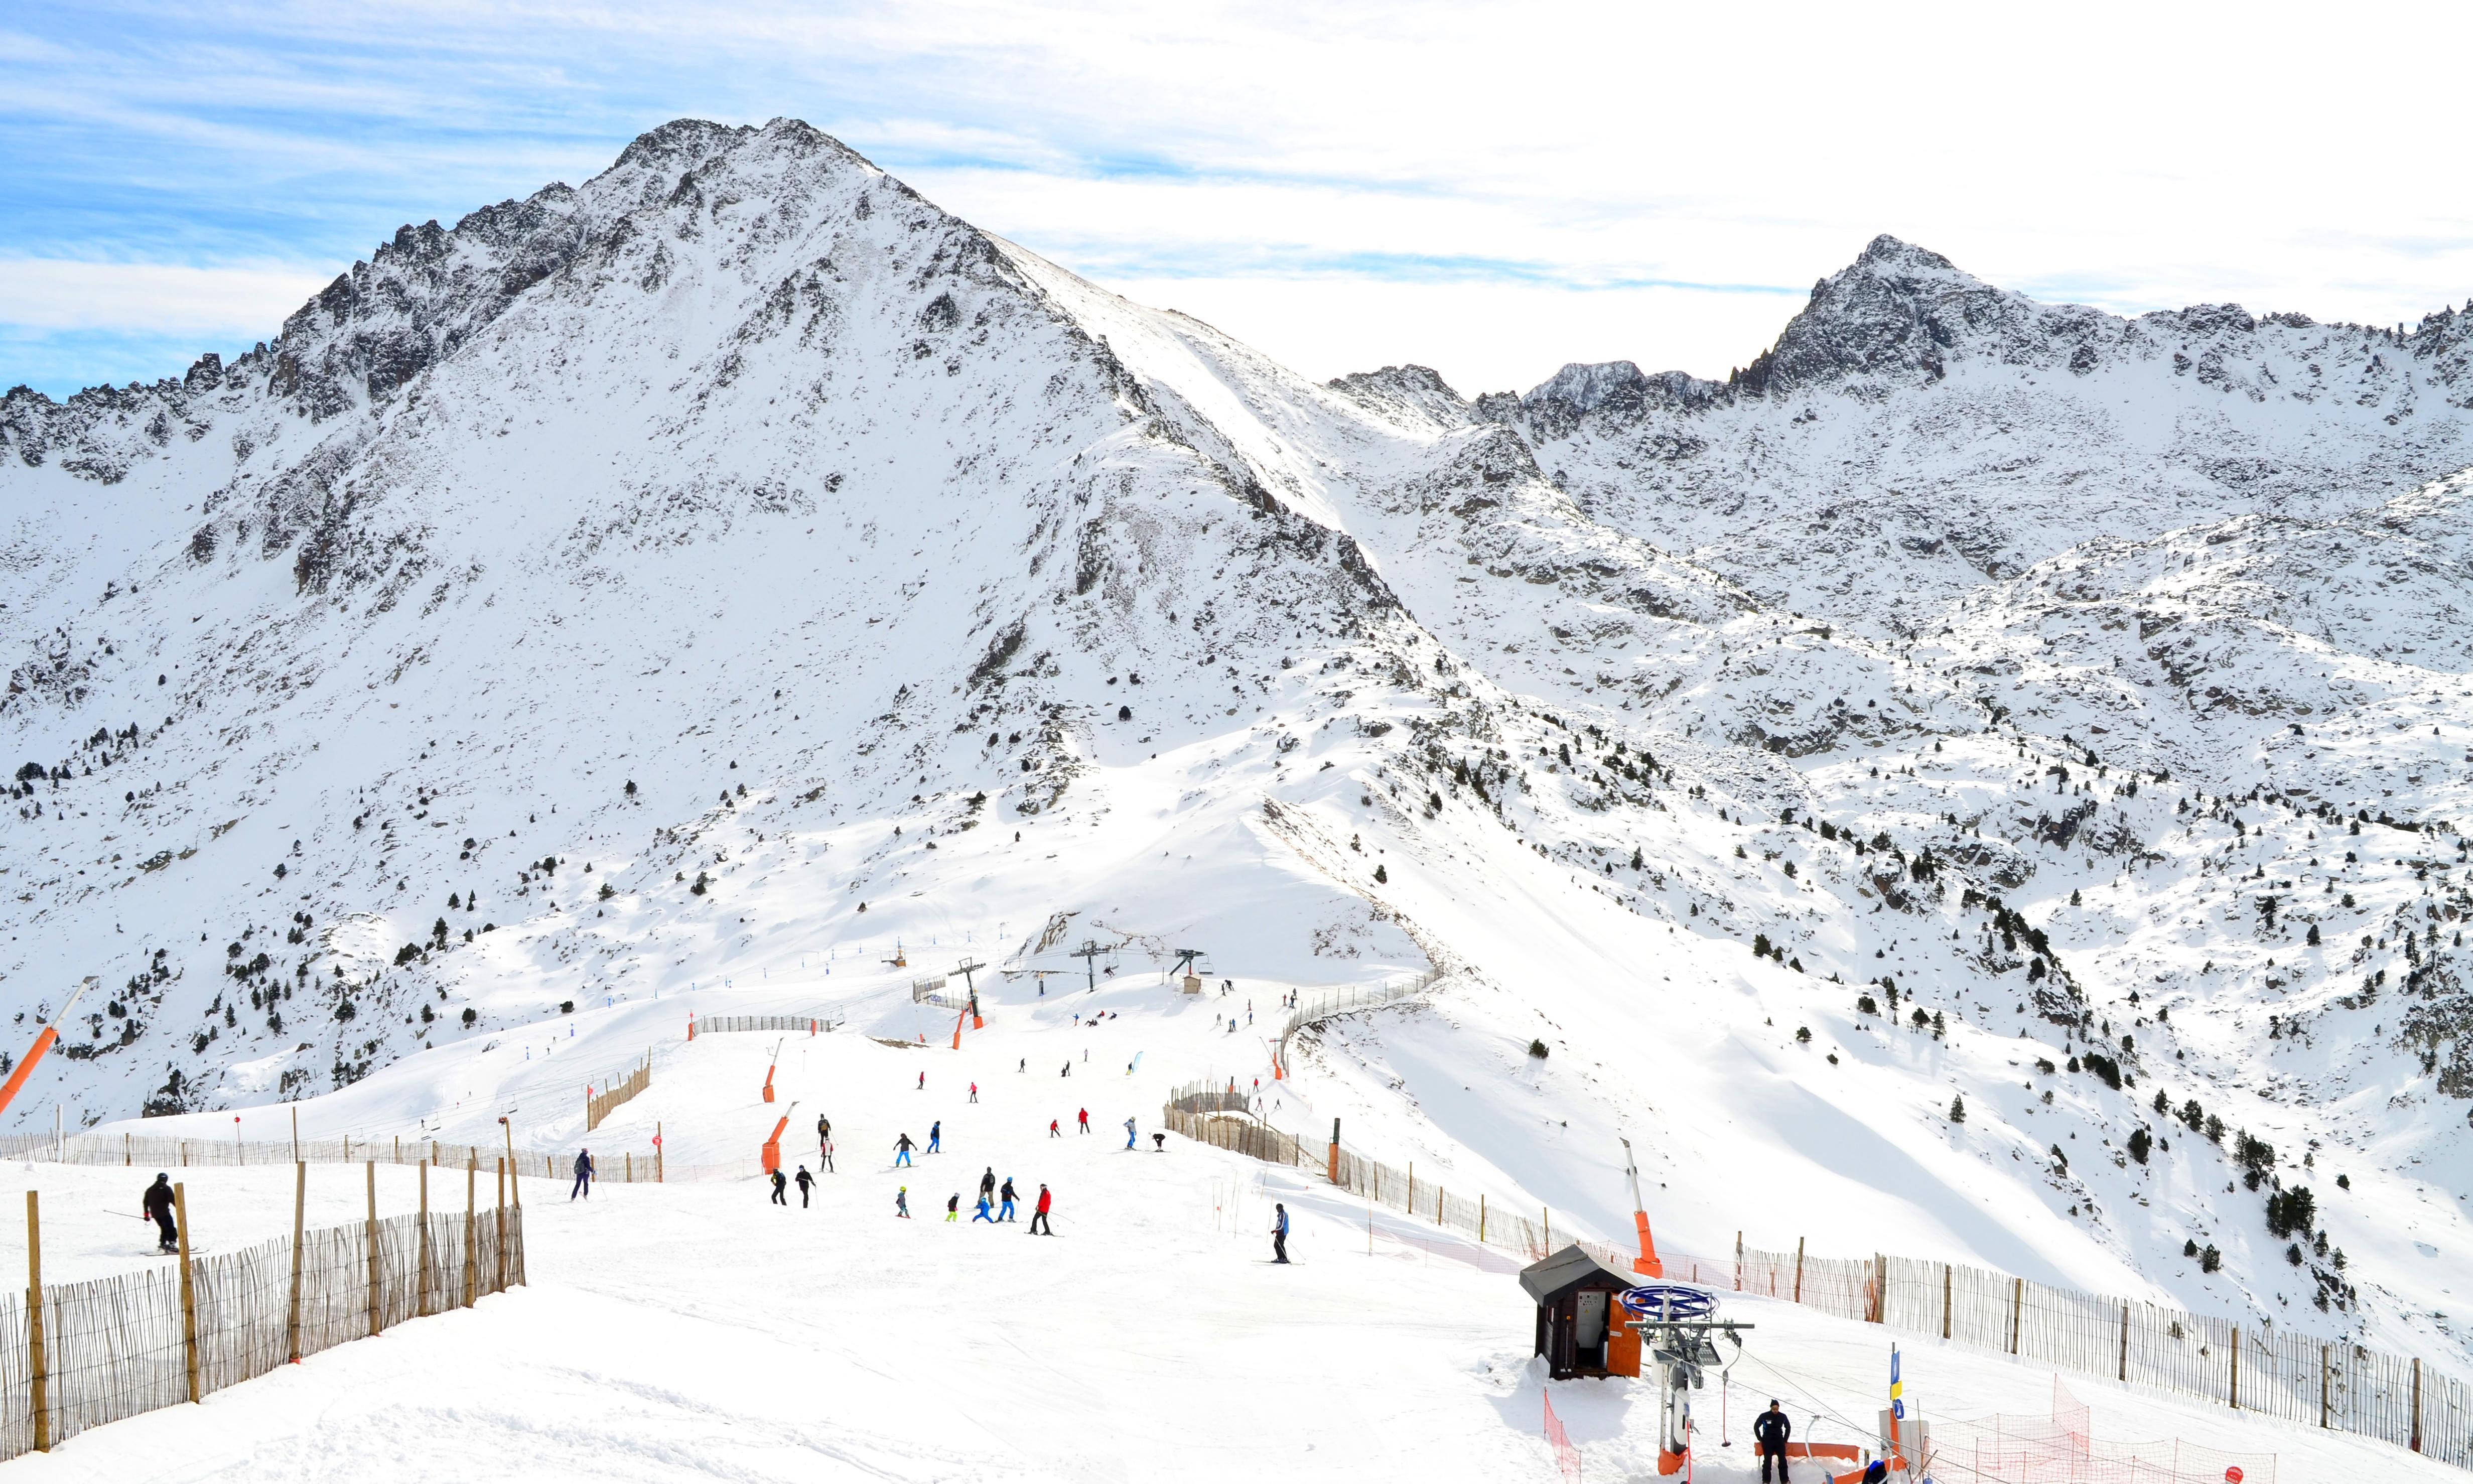 British man dies after snowboarding crash at Andorra ski resort